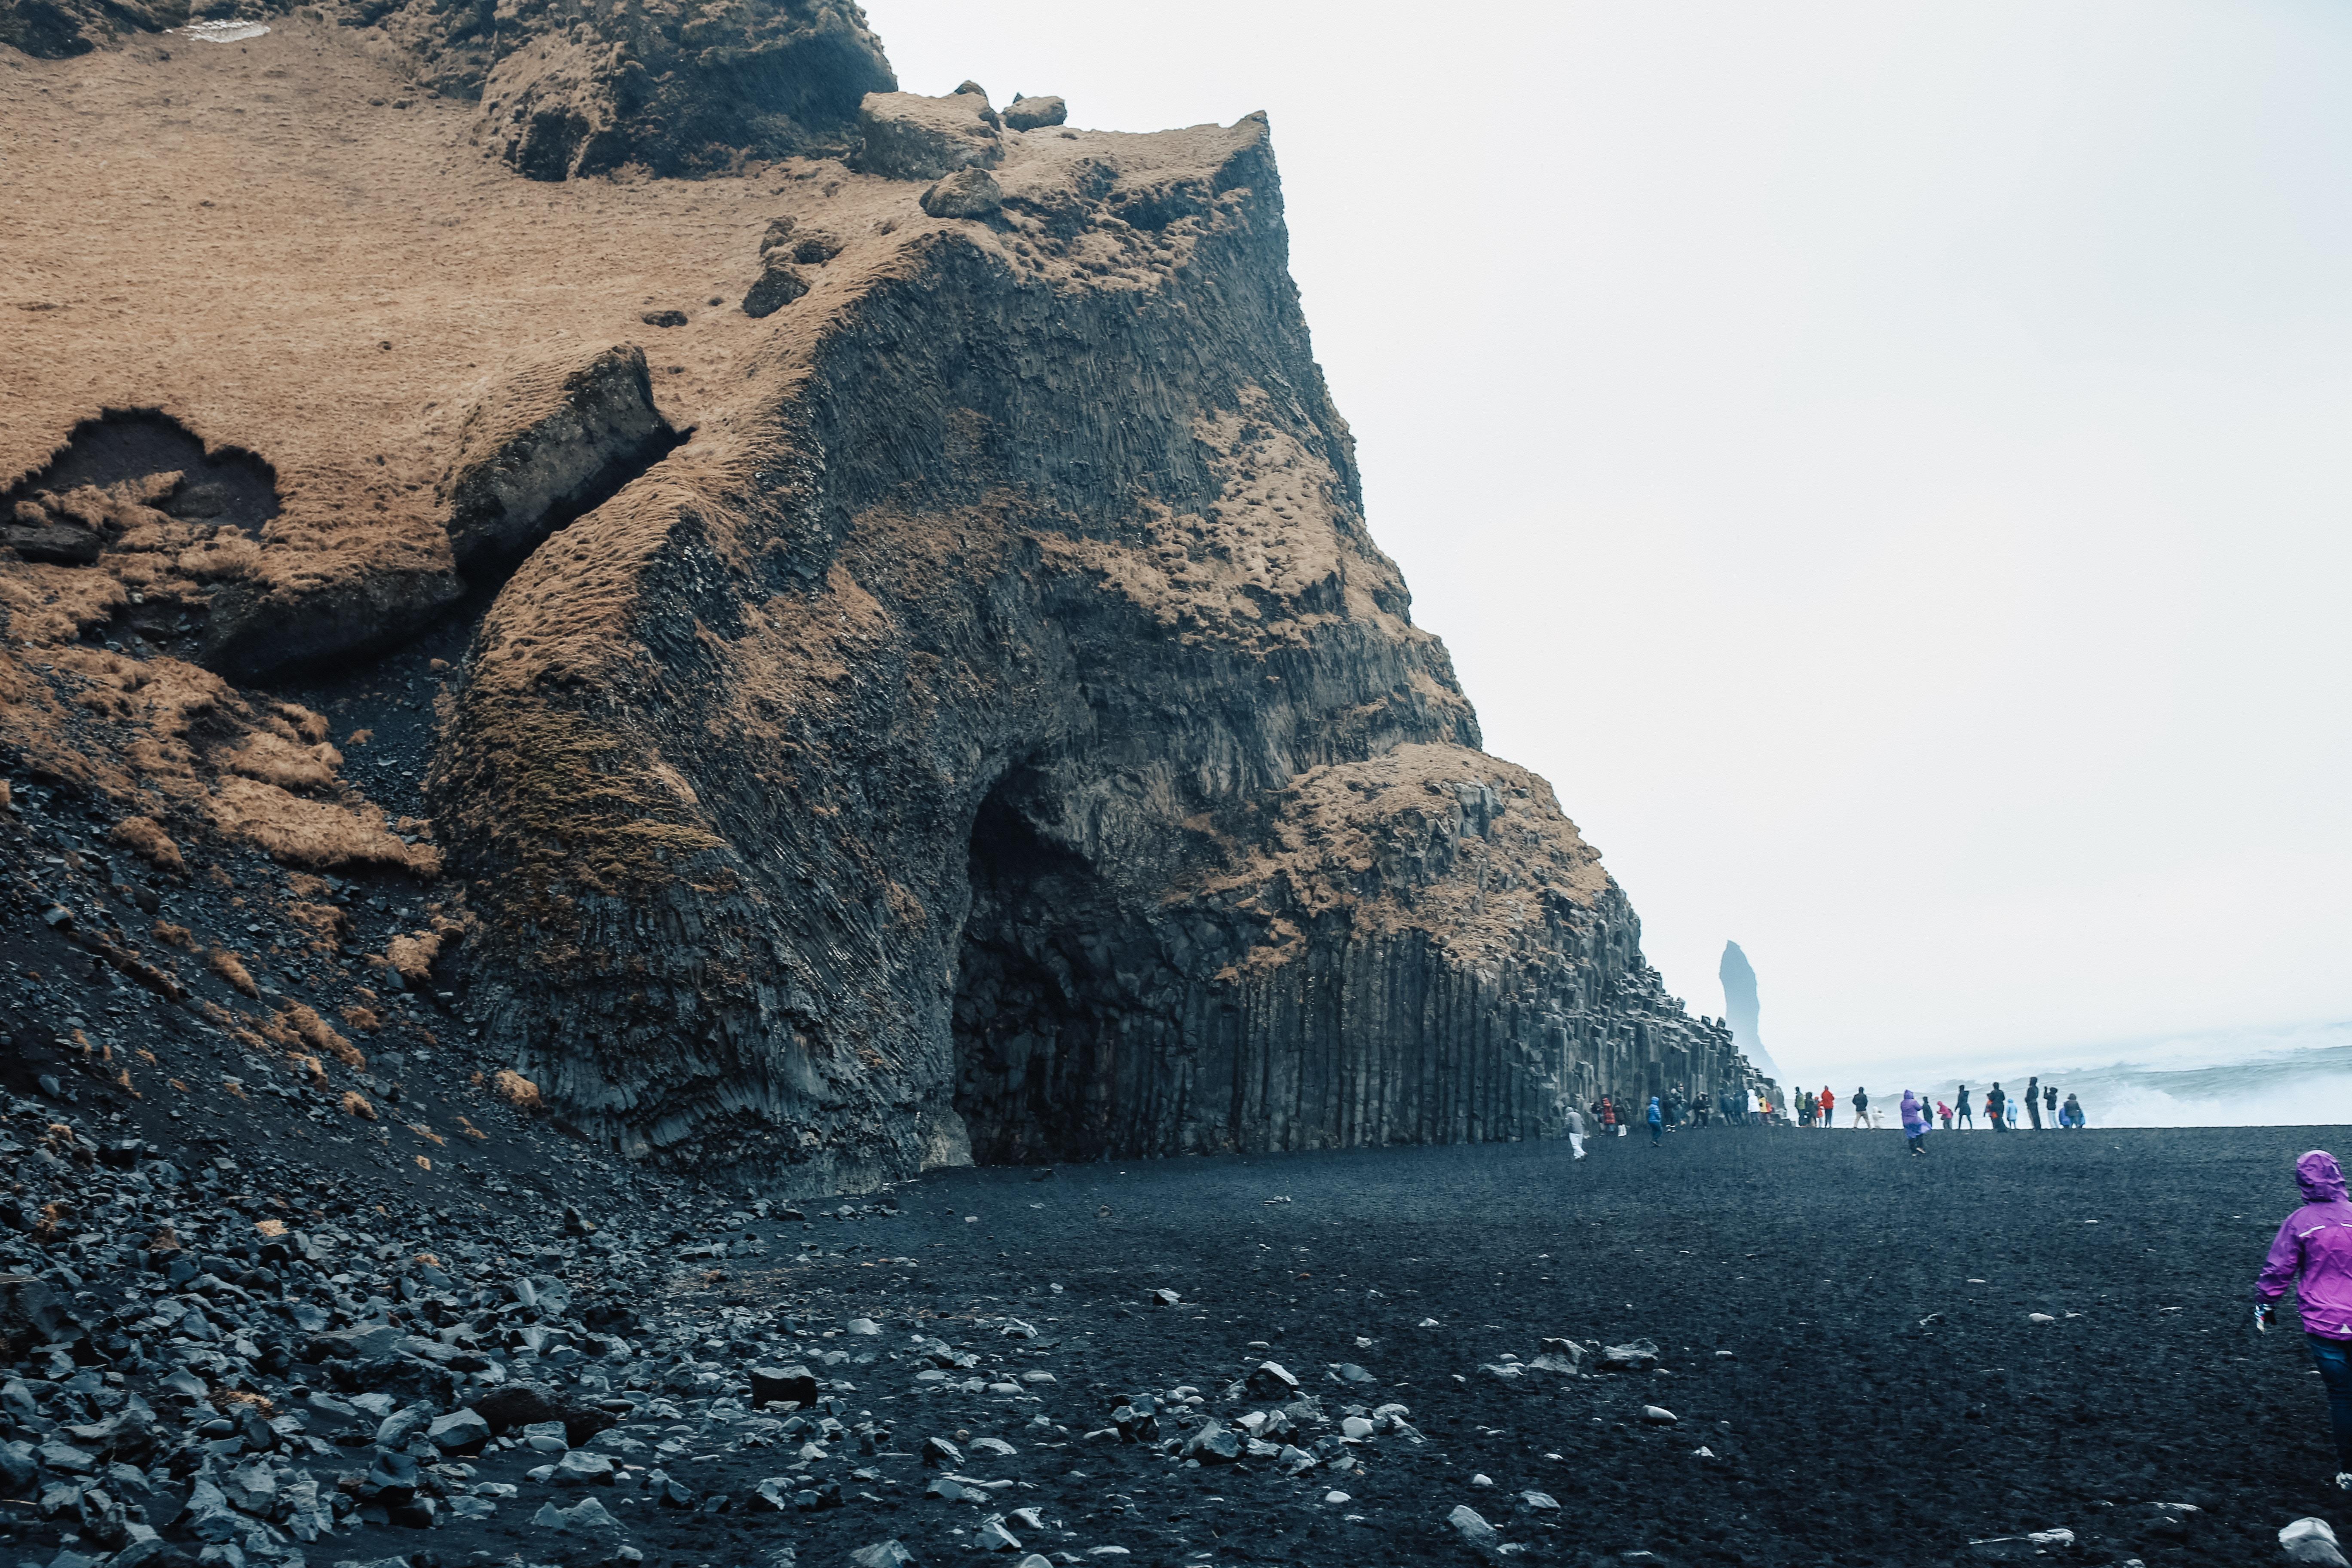 Stunning vistas at Iceland's black sand beach, Reynisfjara Beach located in Vík.